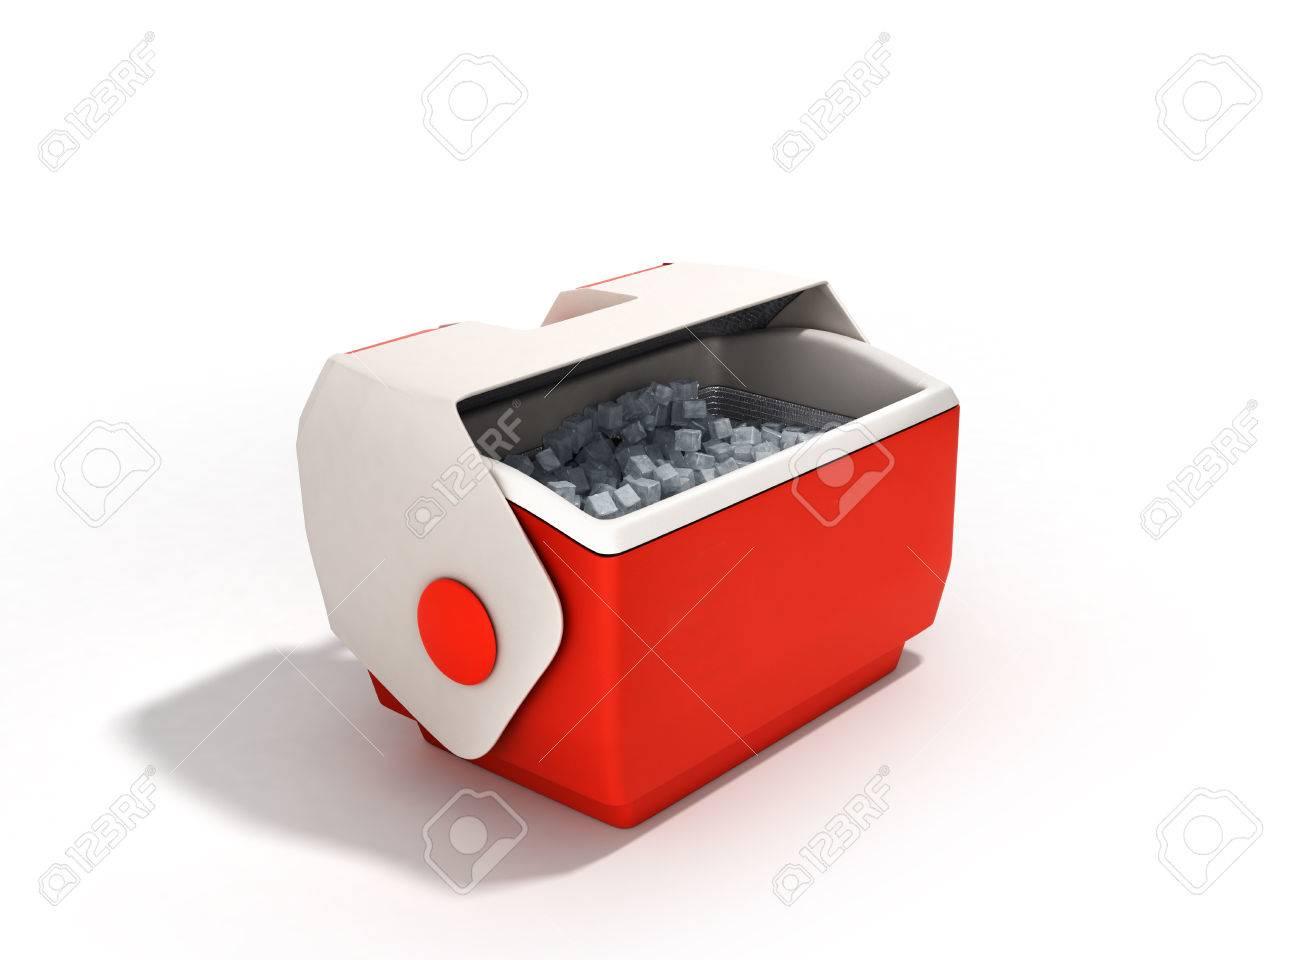 Bomann Kühlschrank Piept : Kühlschrank rot magnetfolie din a zum beschriften und